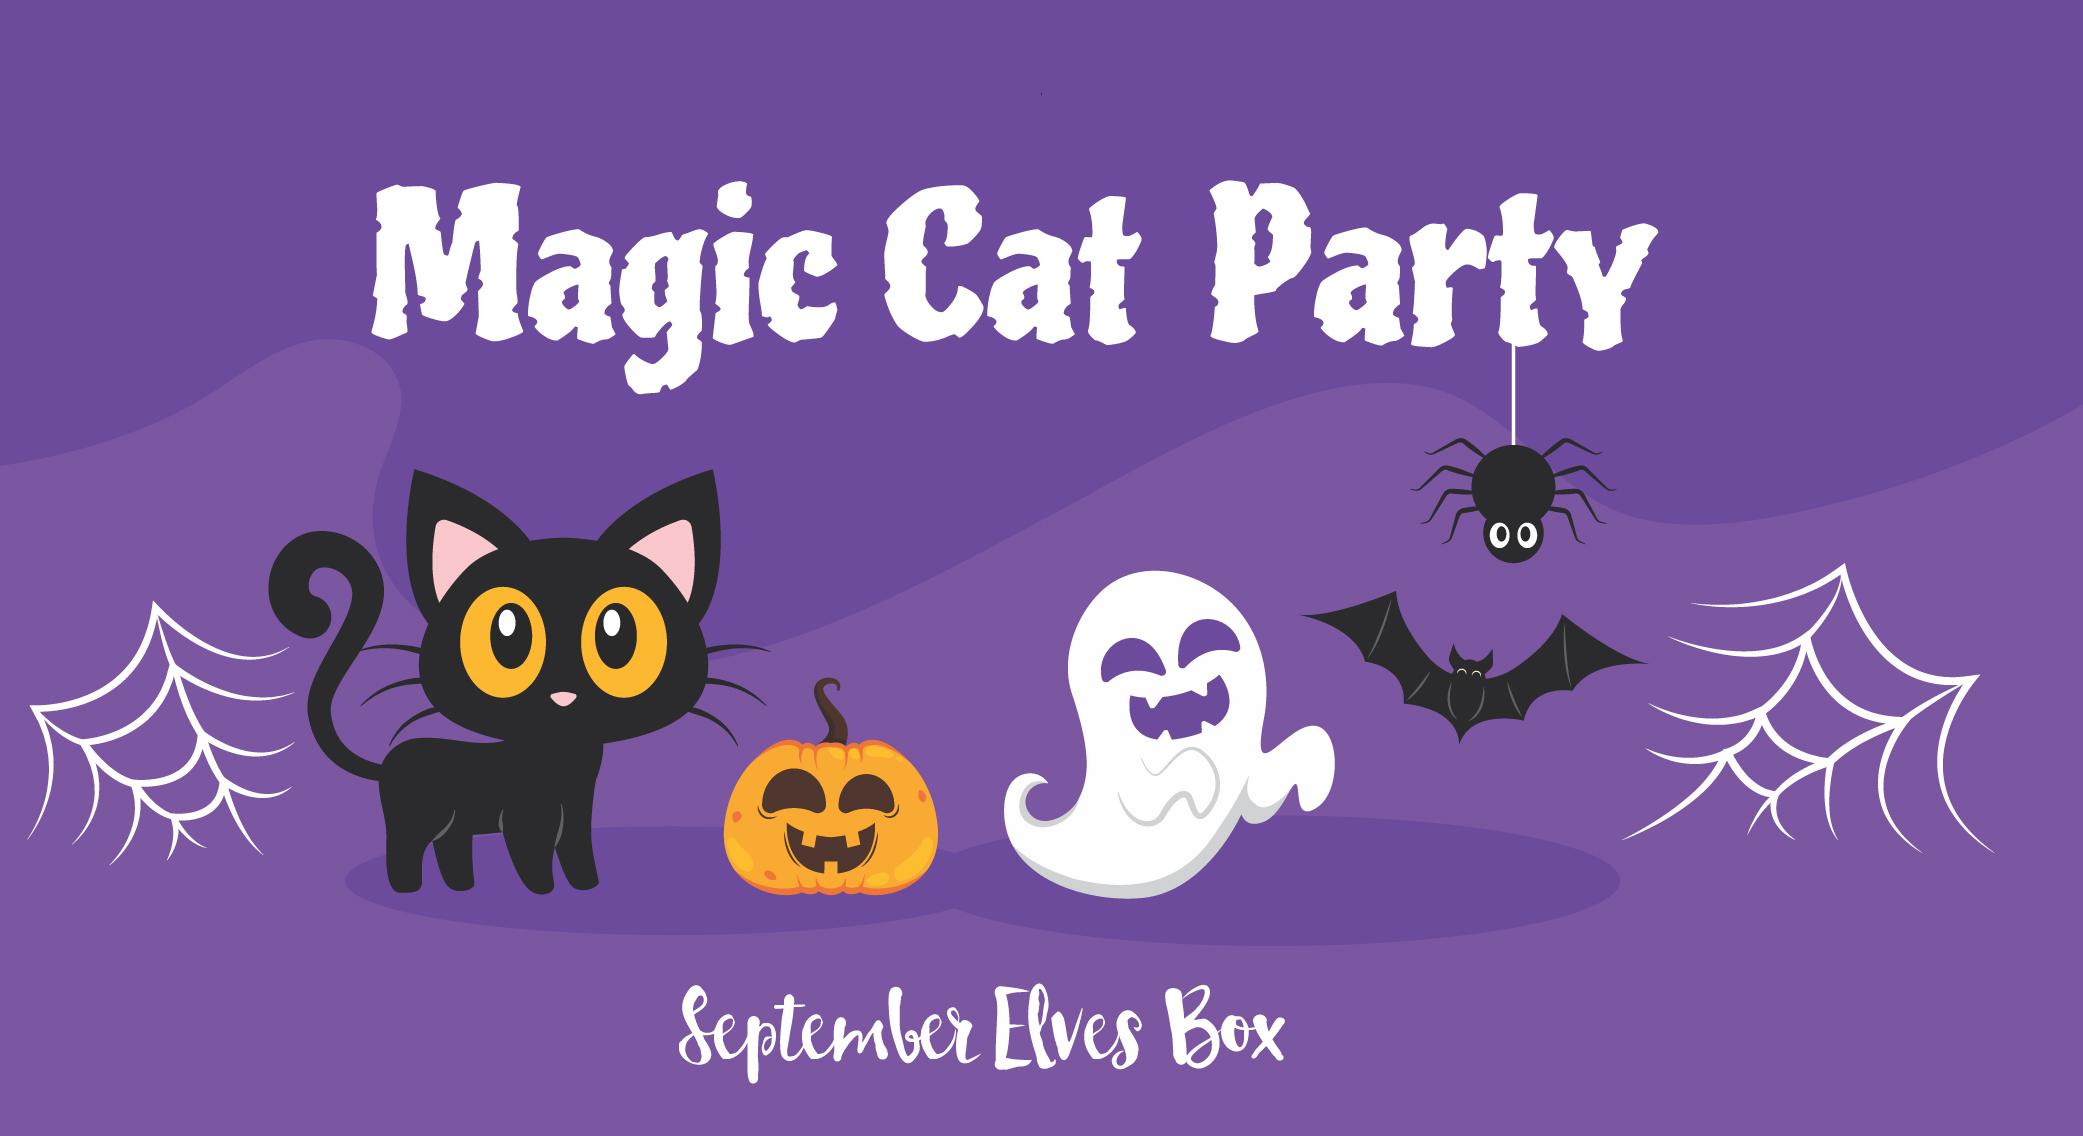 sept-magic-cat-party-fb.jpg